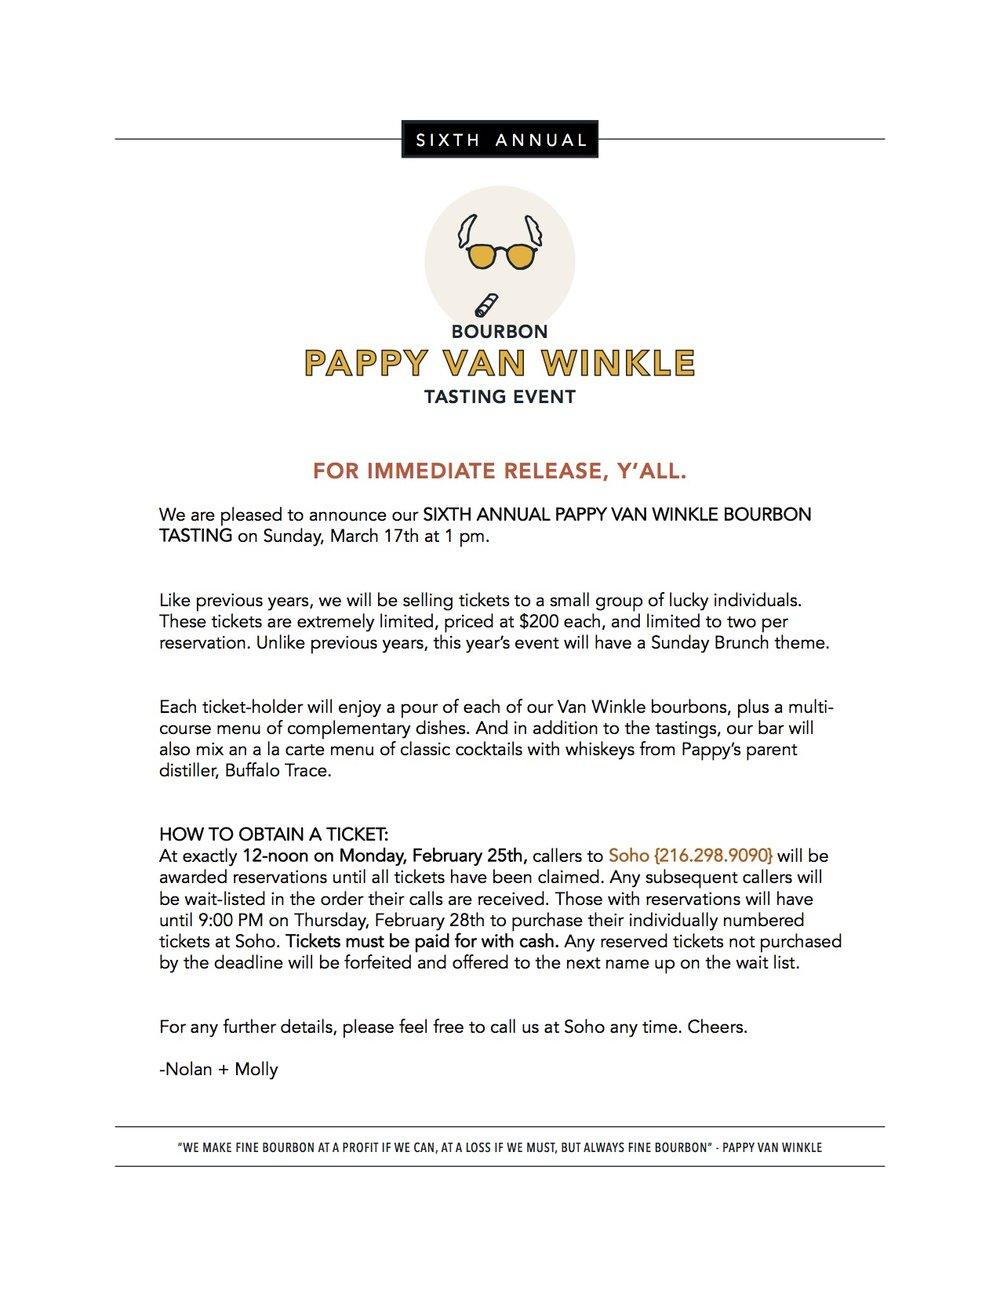 pvw press release 2019.jpg